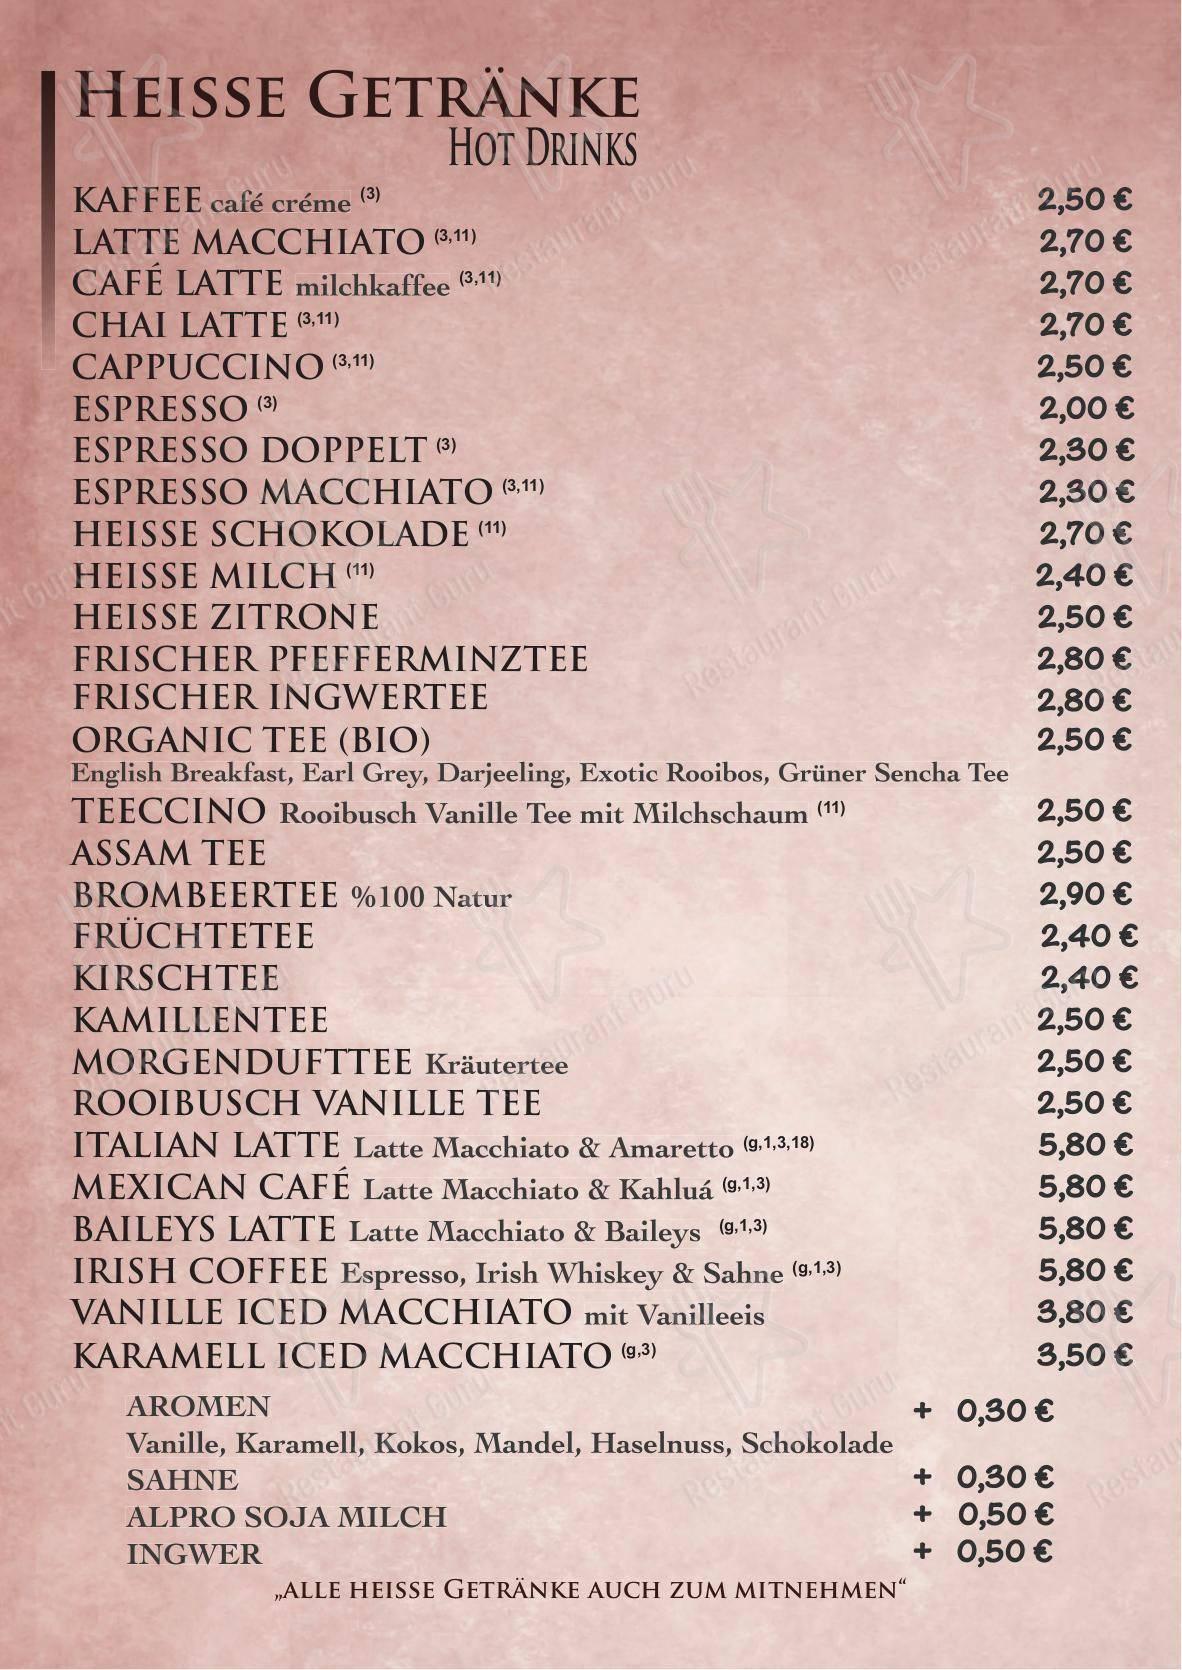 Speisekarte von Chakra Café cafe